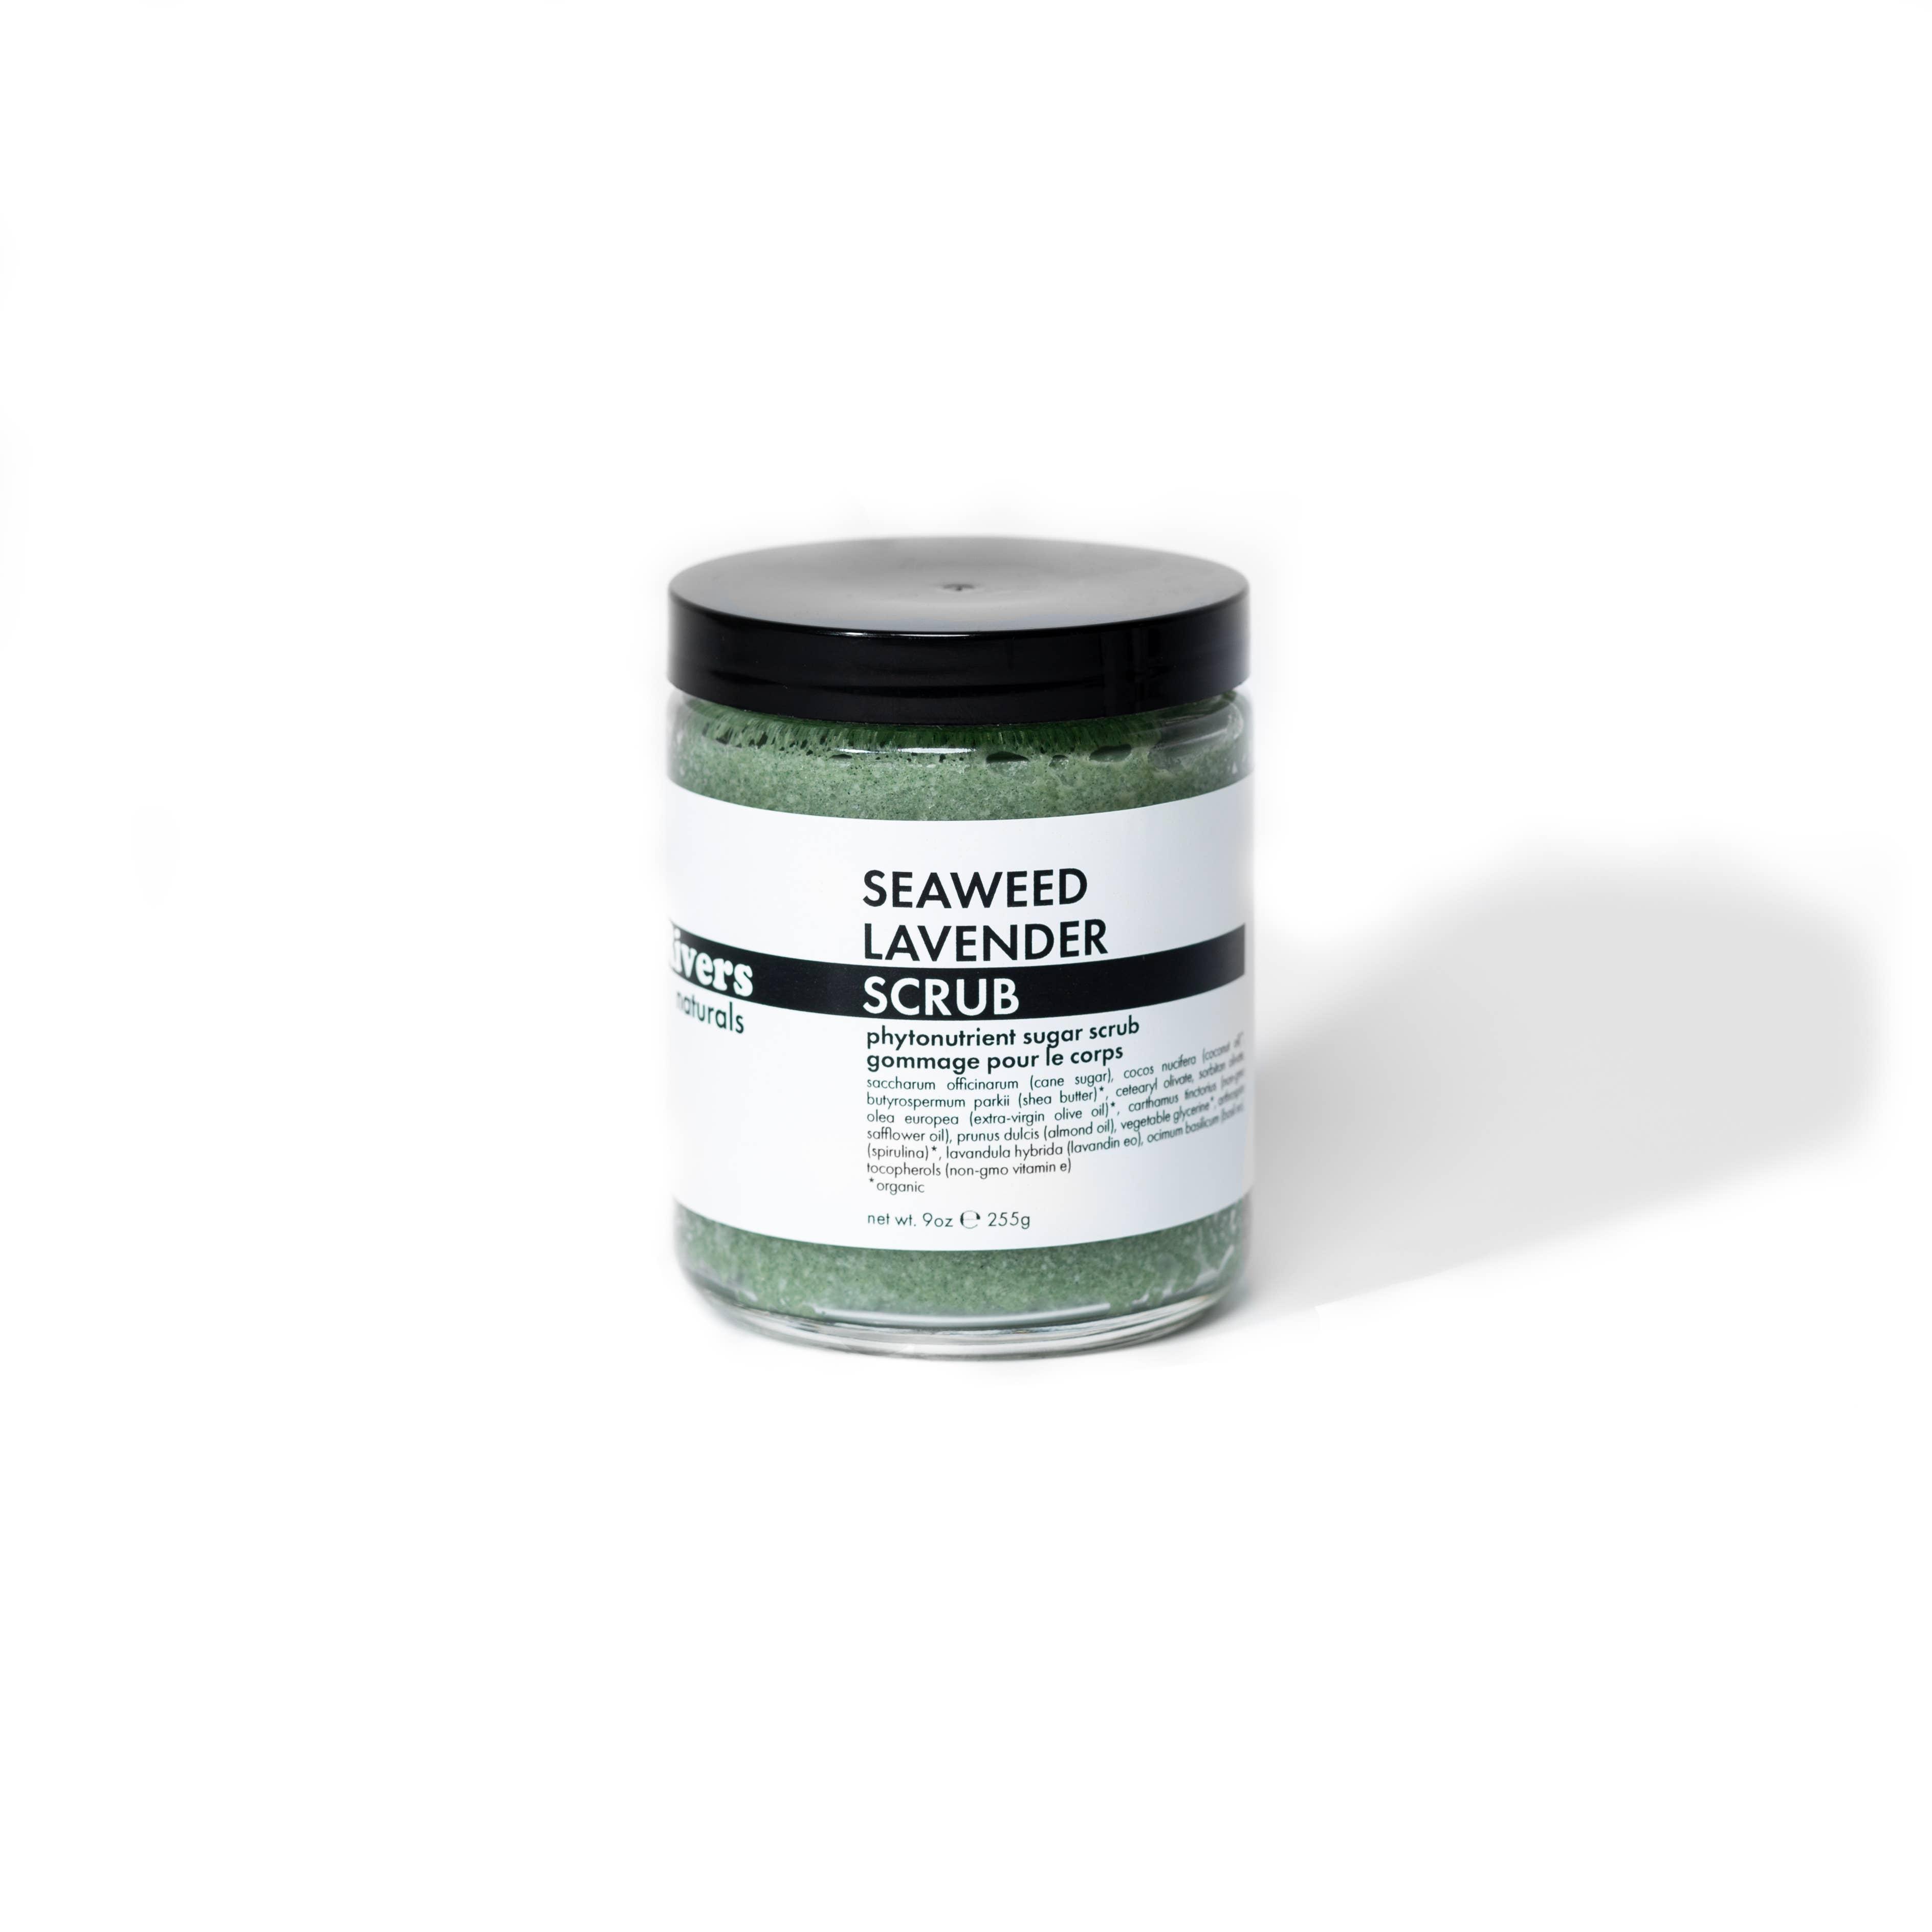 Seaweed Lavender Scrub 8oz | Trada Marketplace